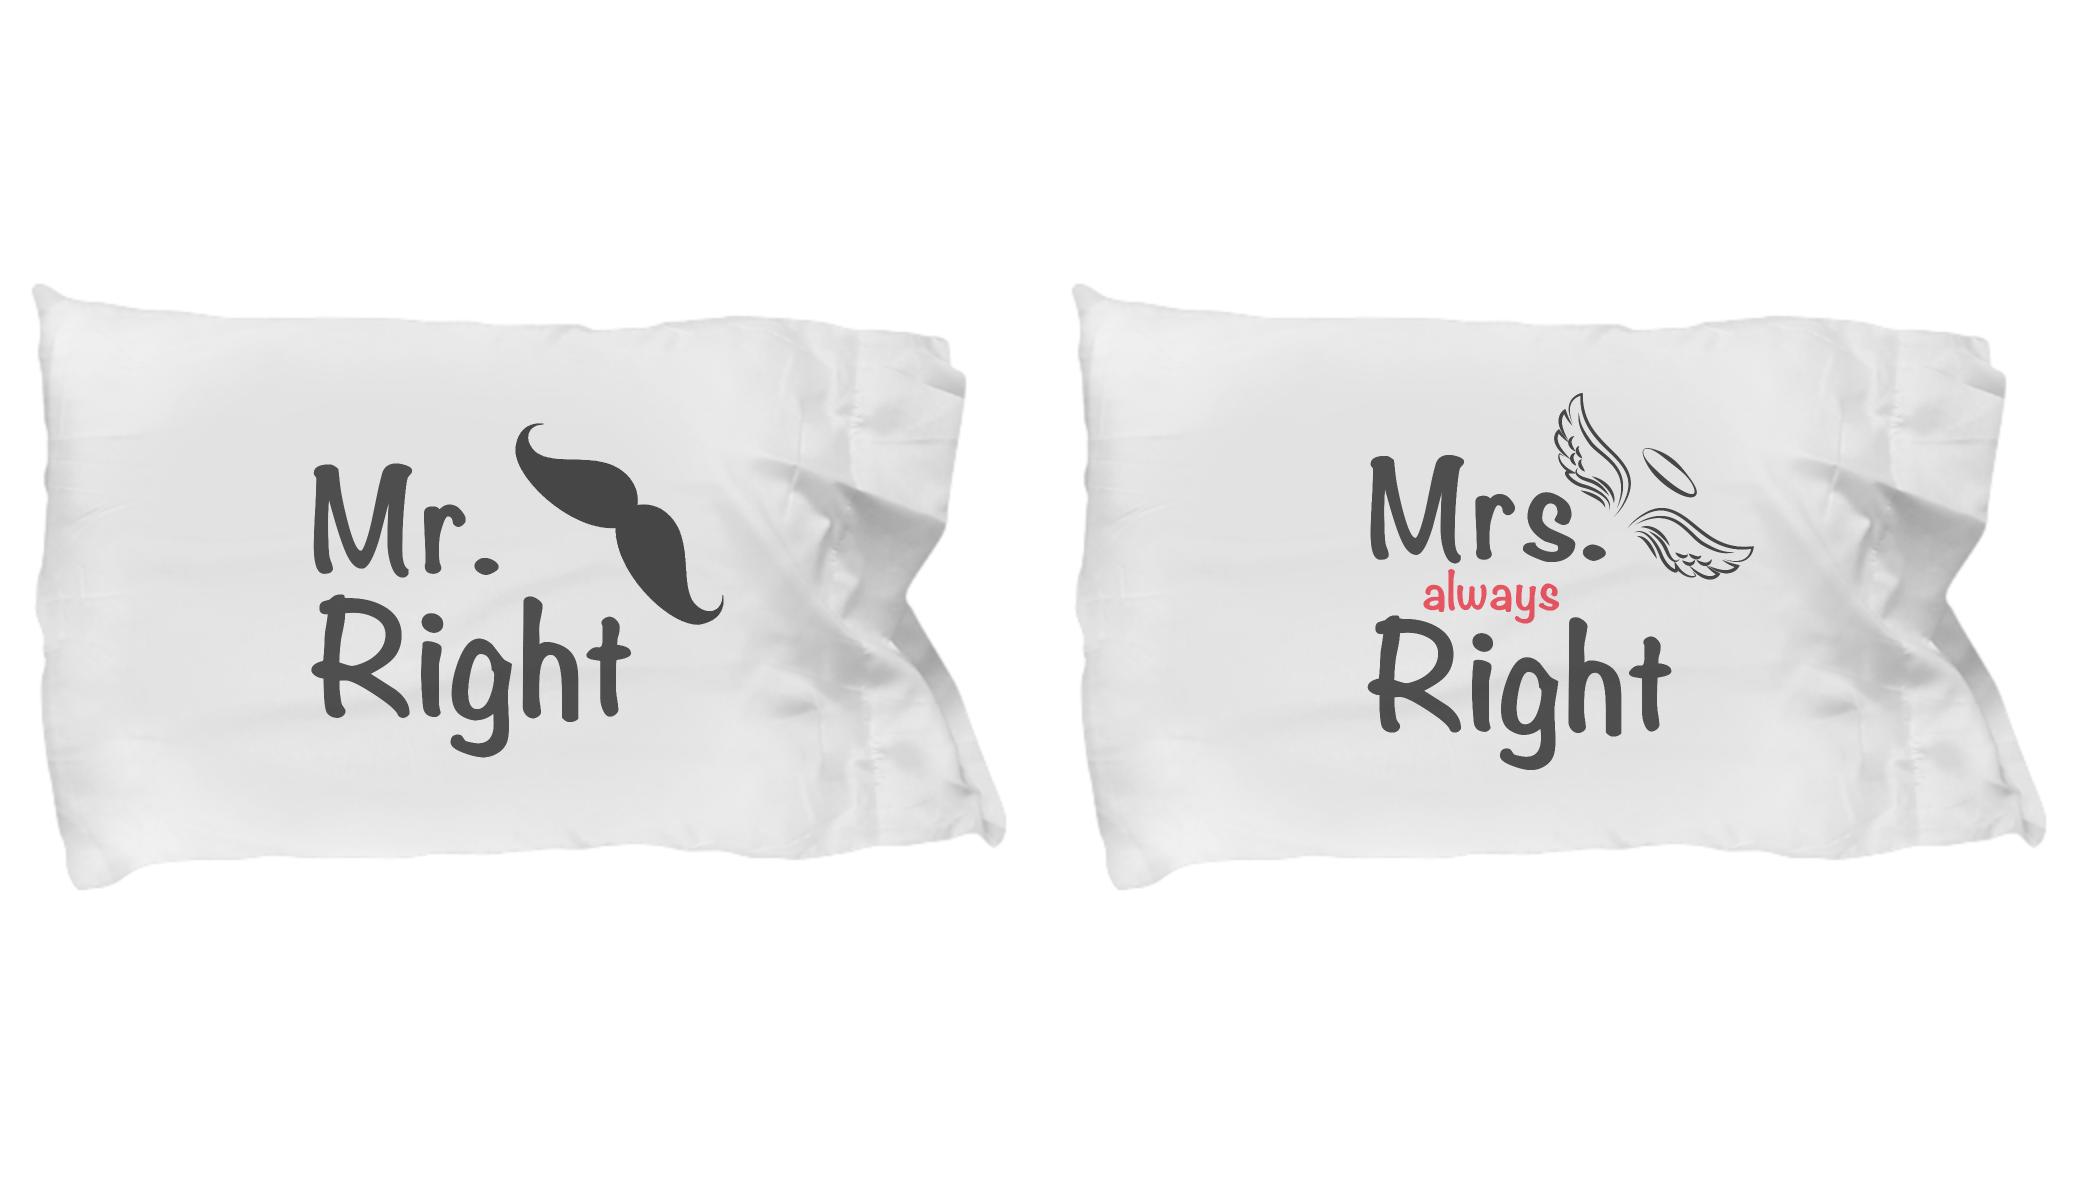 Mr Right Mrs Right Bettwäsche Mr Right Mrs Always Right Pajamas